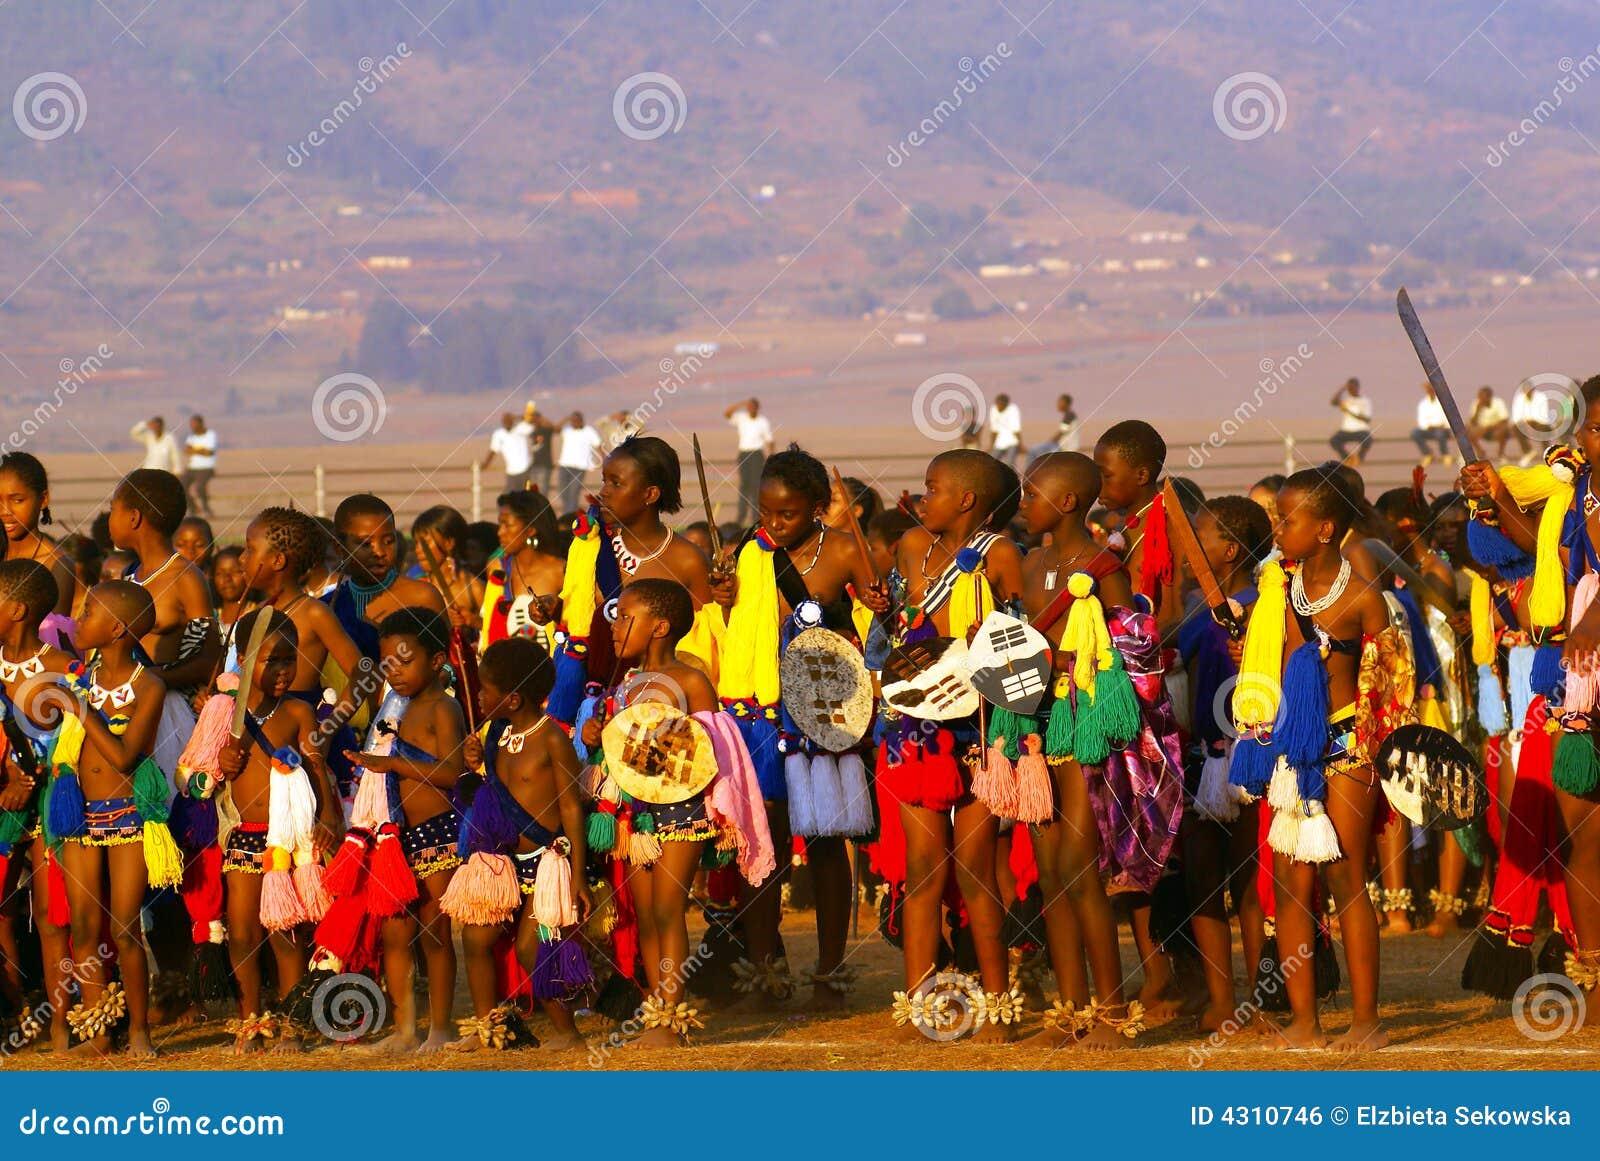 Reedtanz in Swasiland (Afrika)